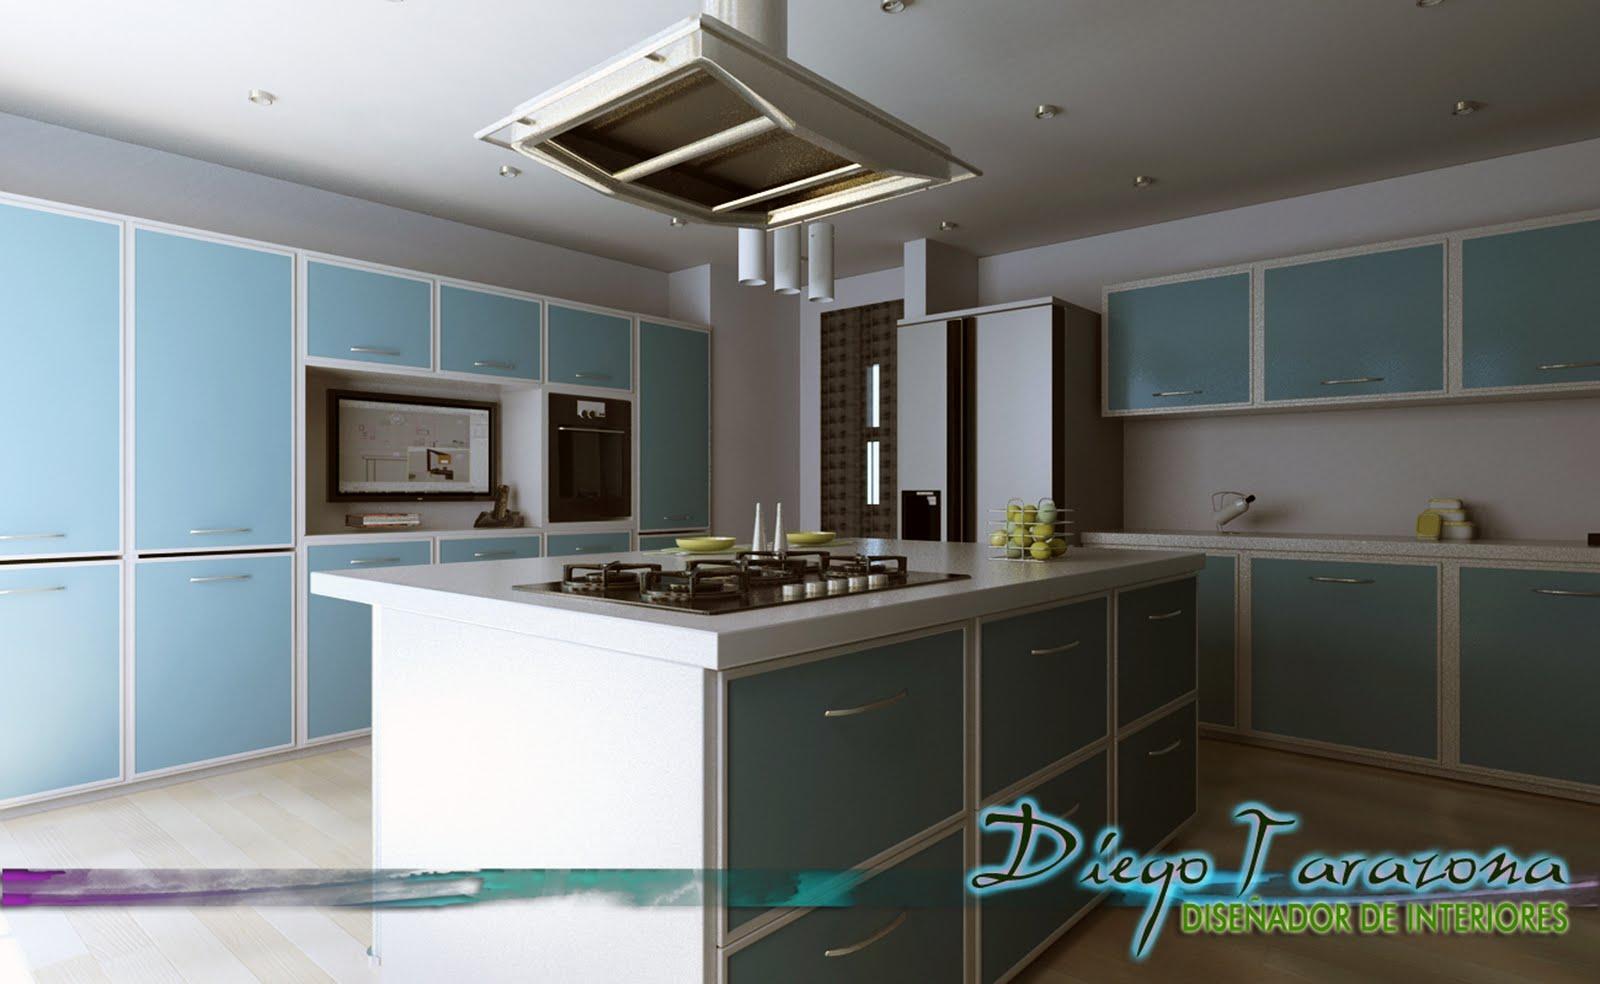 Portafolio diego tarazona dise ador de interiores cocina de receta - Disenador de cocinas ...